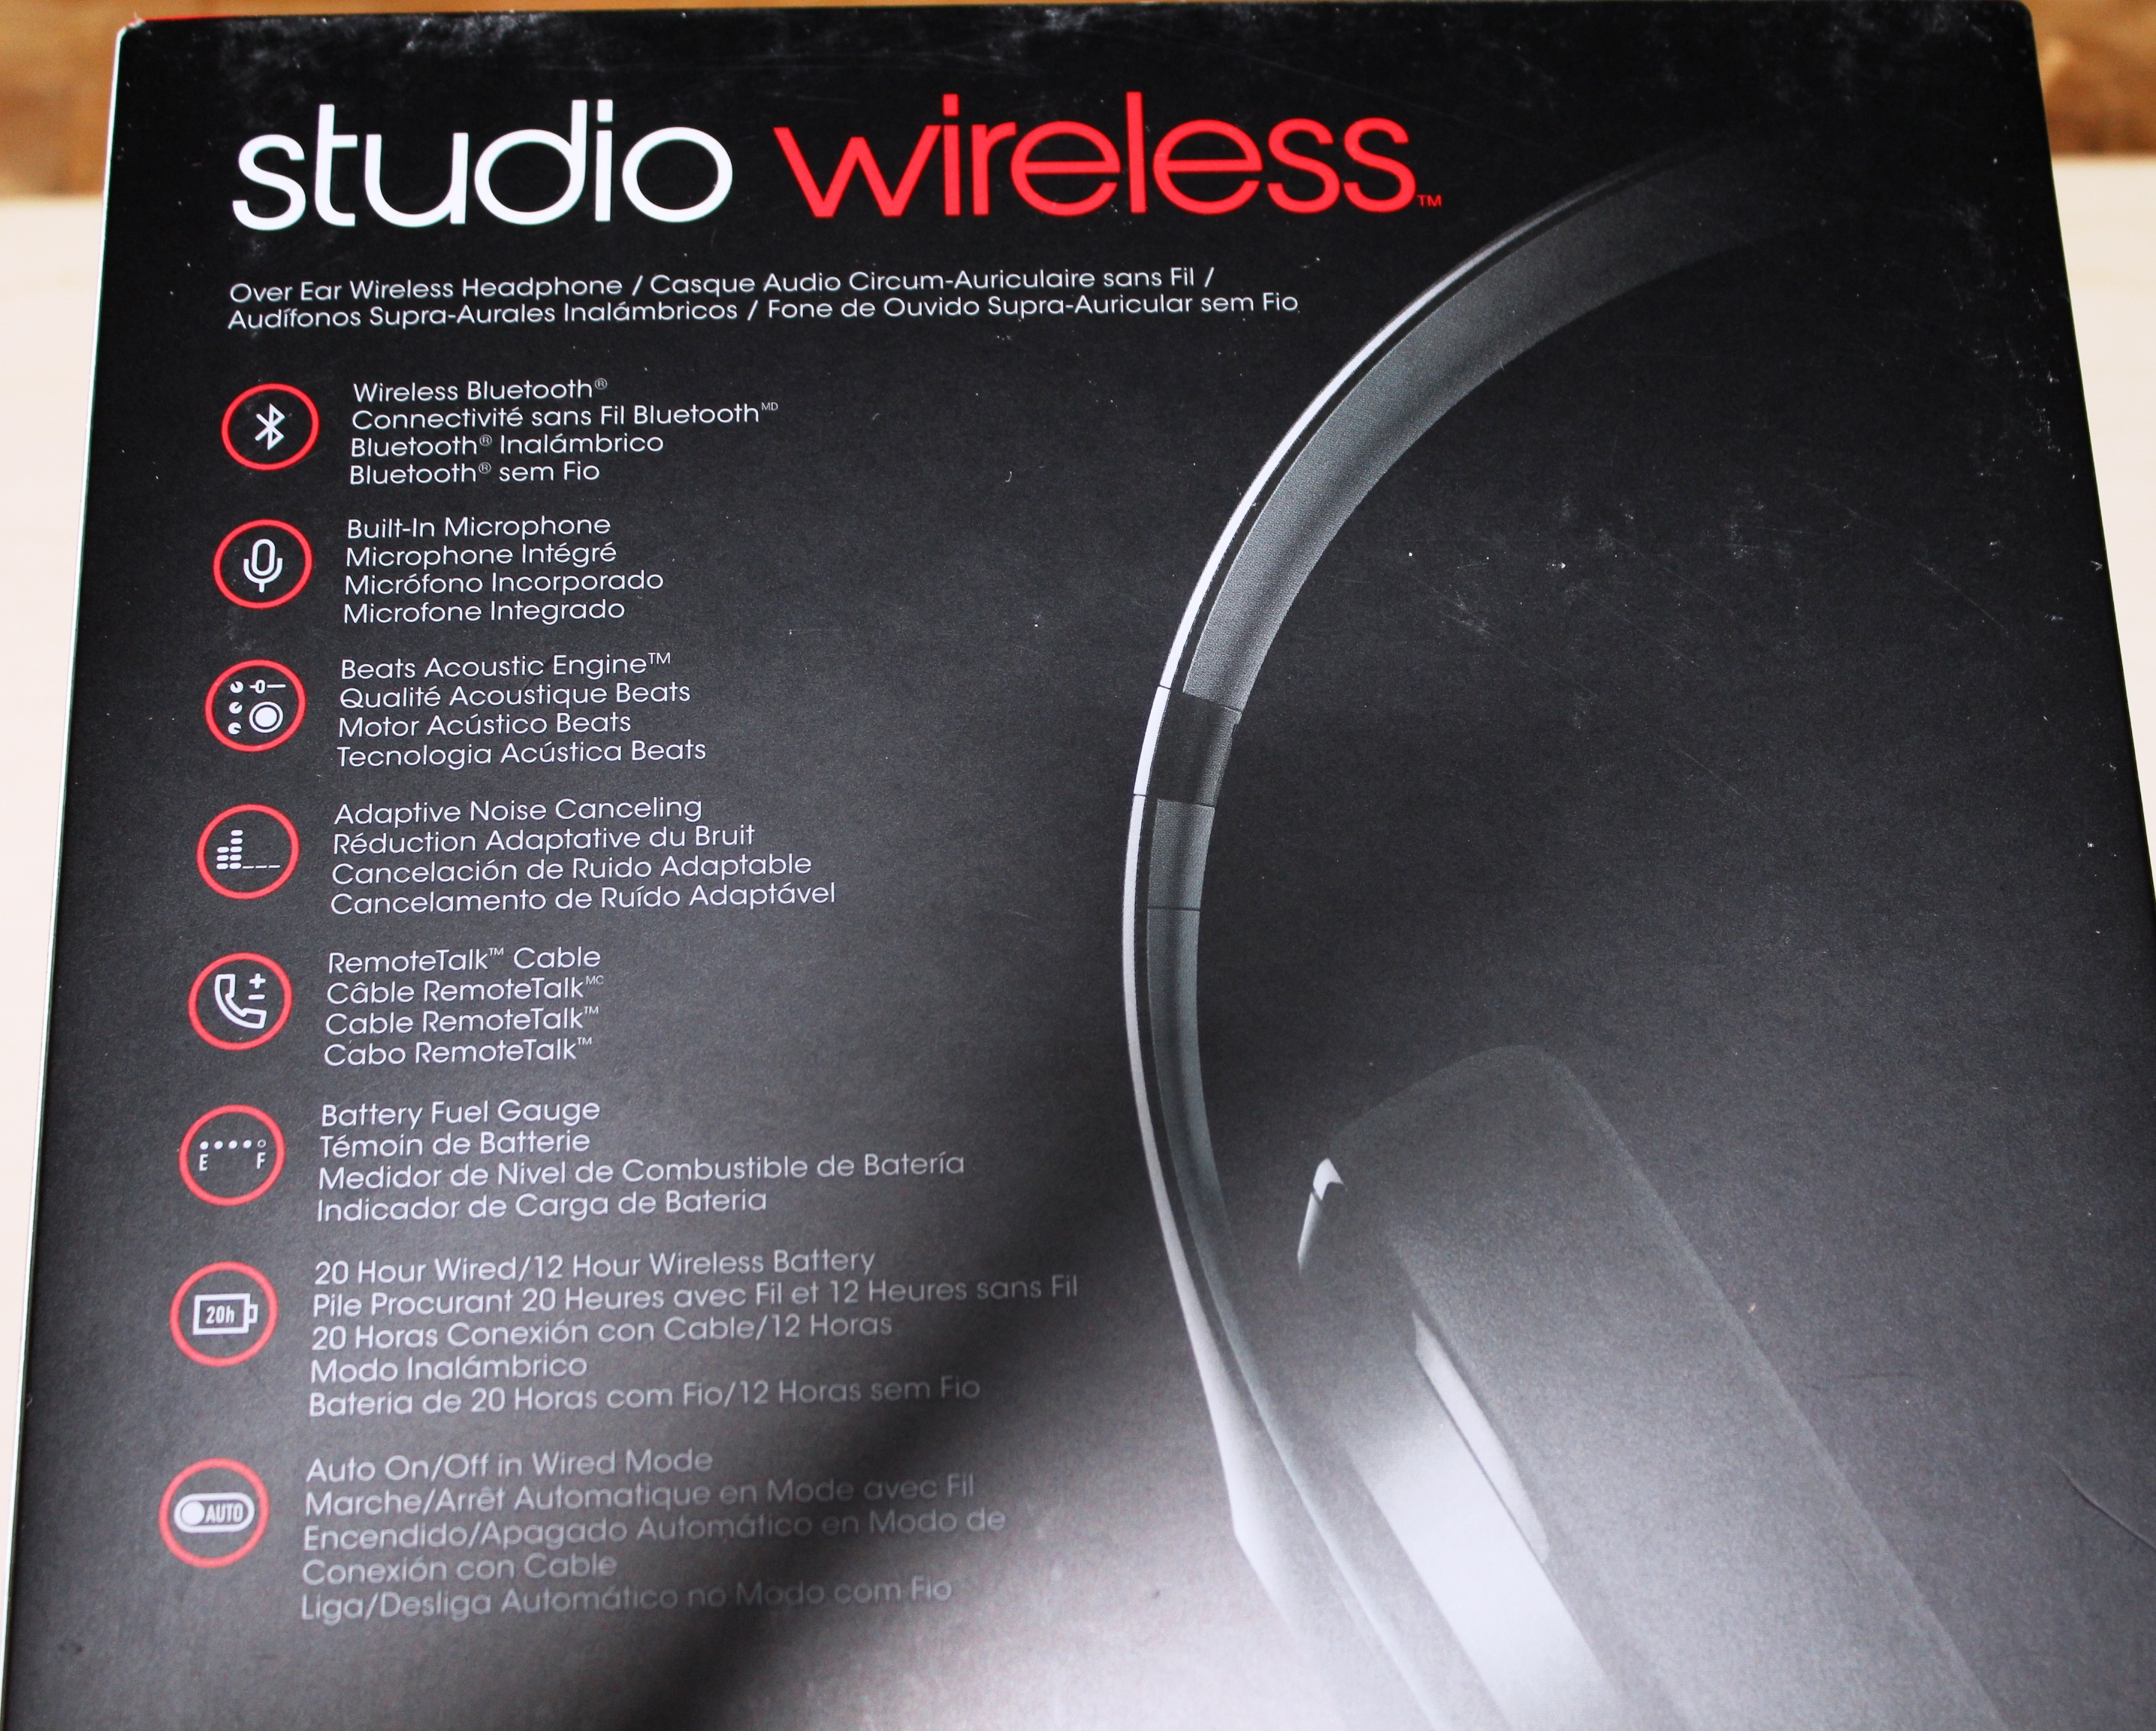 beats studio wireless quick start guide